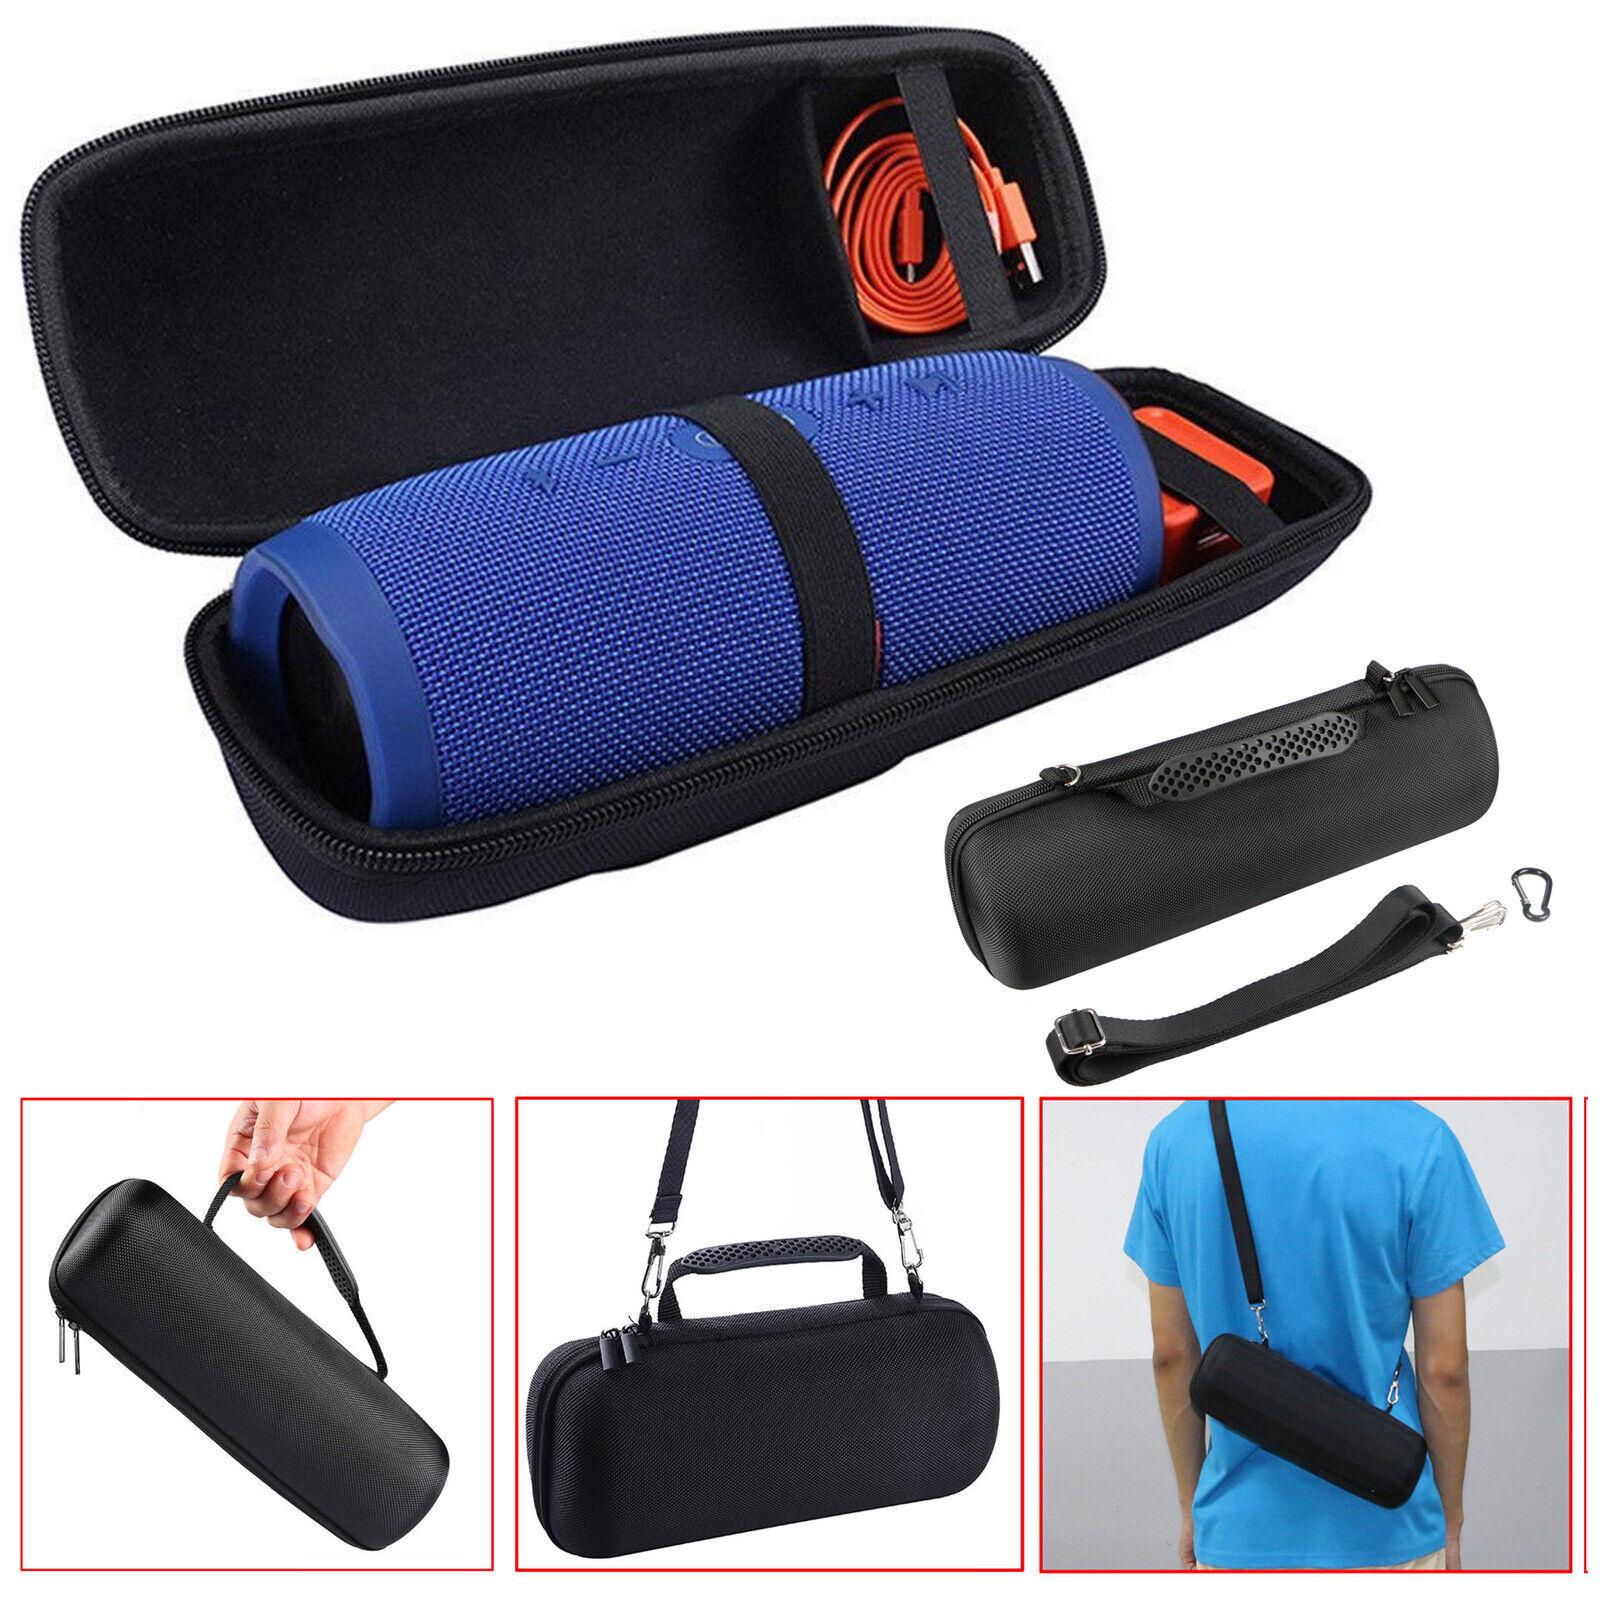 EVA Waterproof Hard Carry Storage Case Bag for JBL Charge 3 Bluetooth Speaker